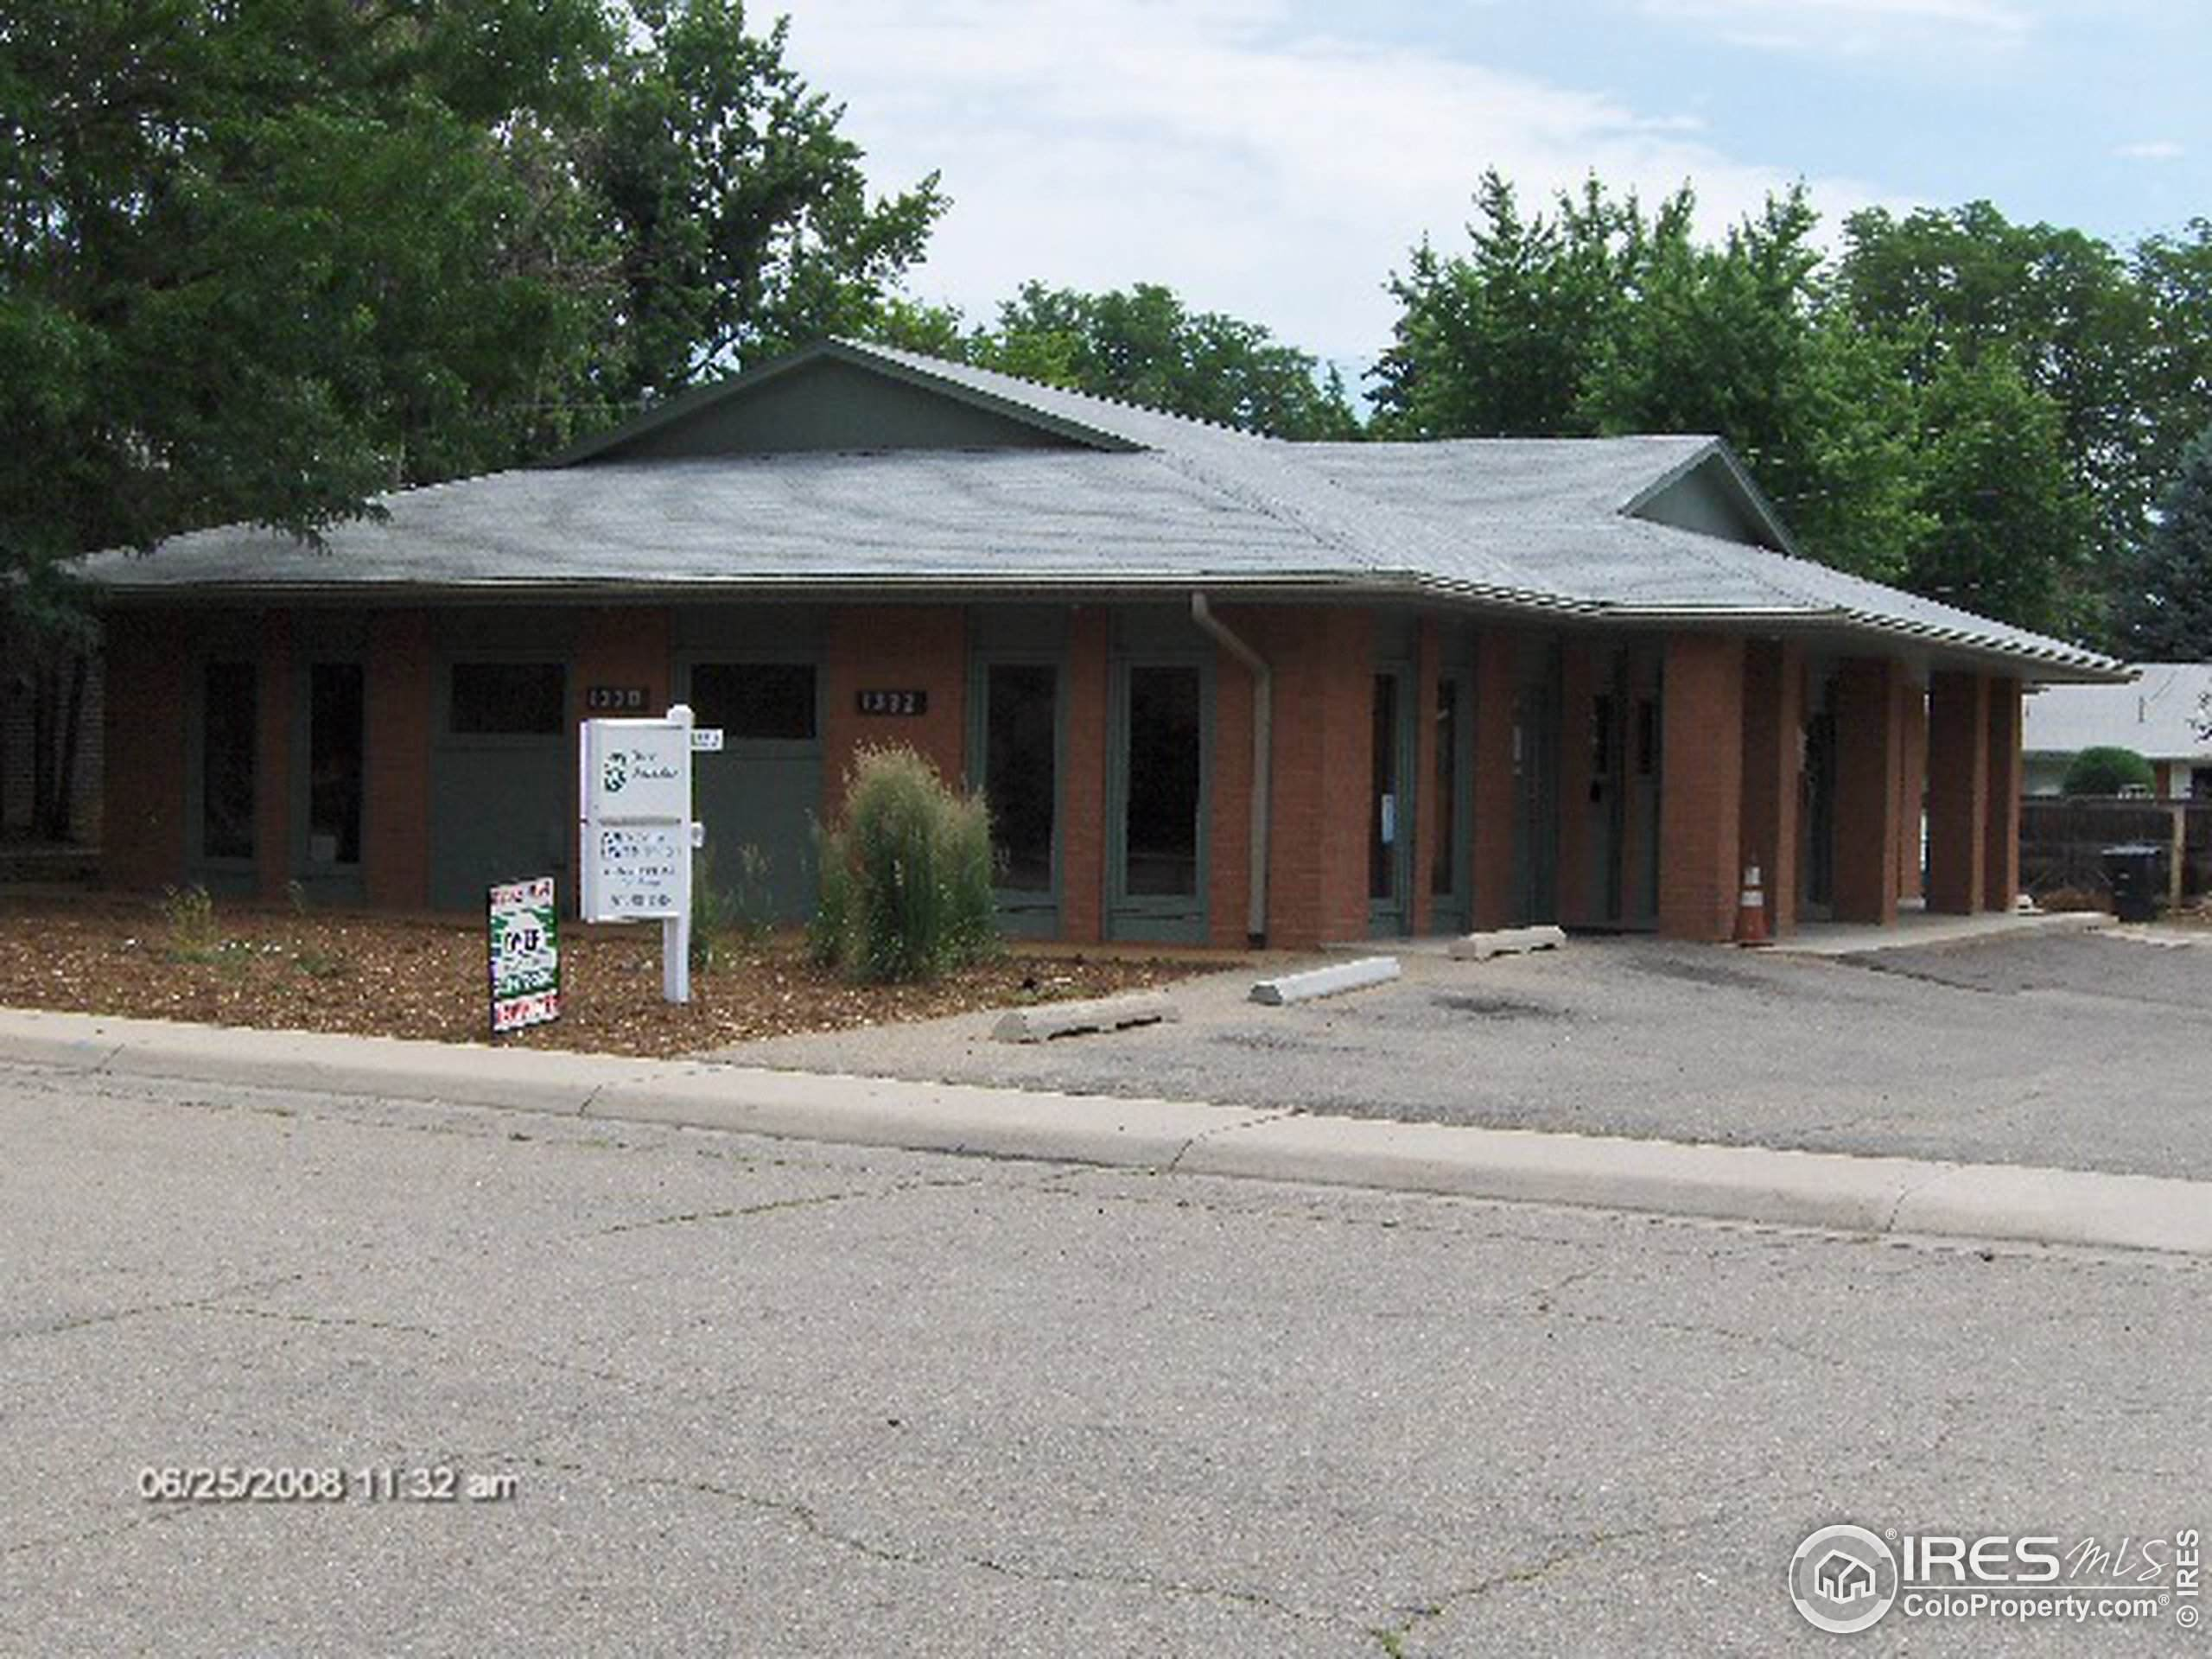 127 Barberry Pl, Loveland, CO 80537 (MLS #903283) :: J2 Real Estate Group at Remax Alliance